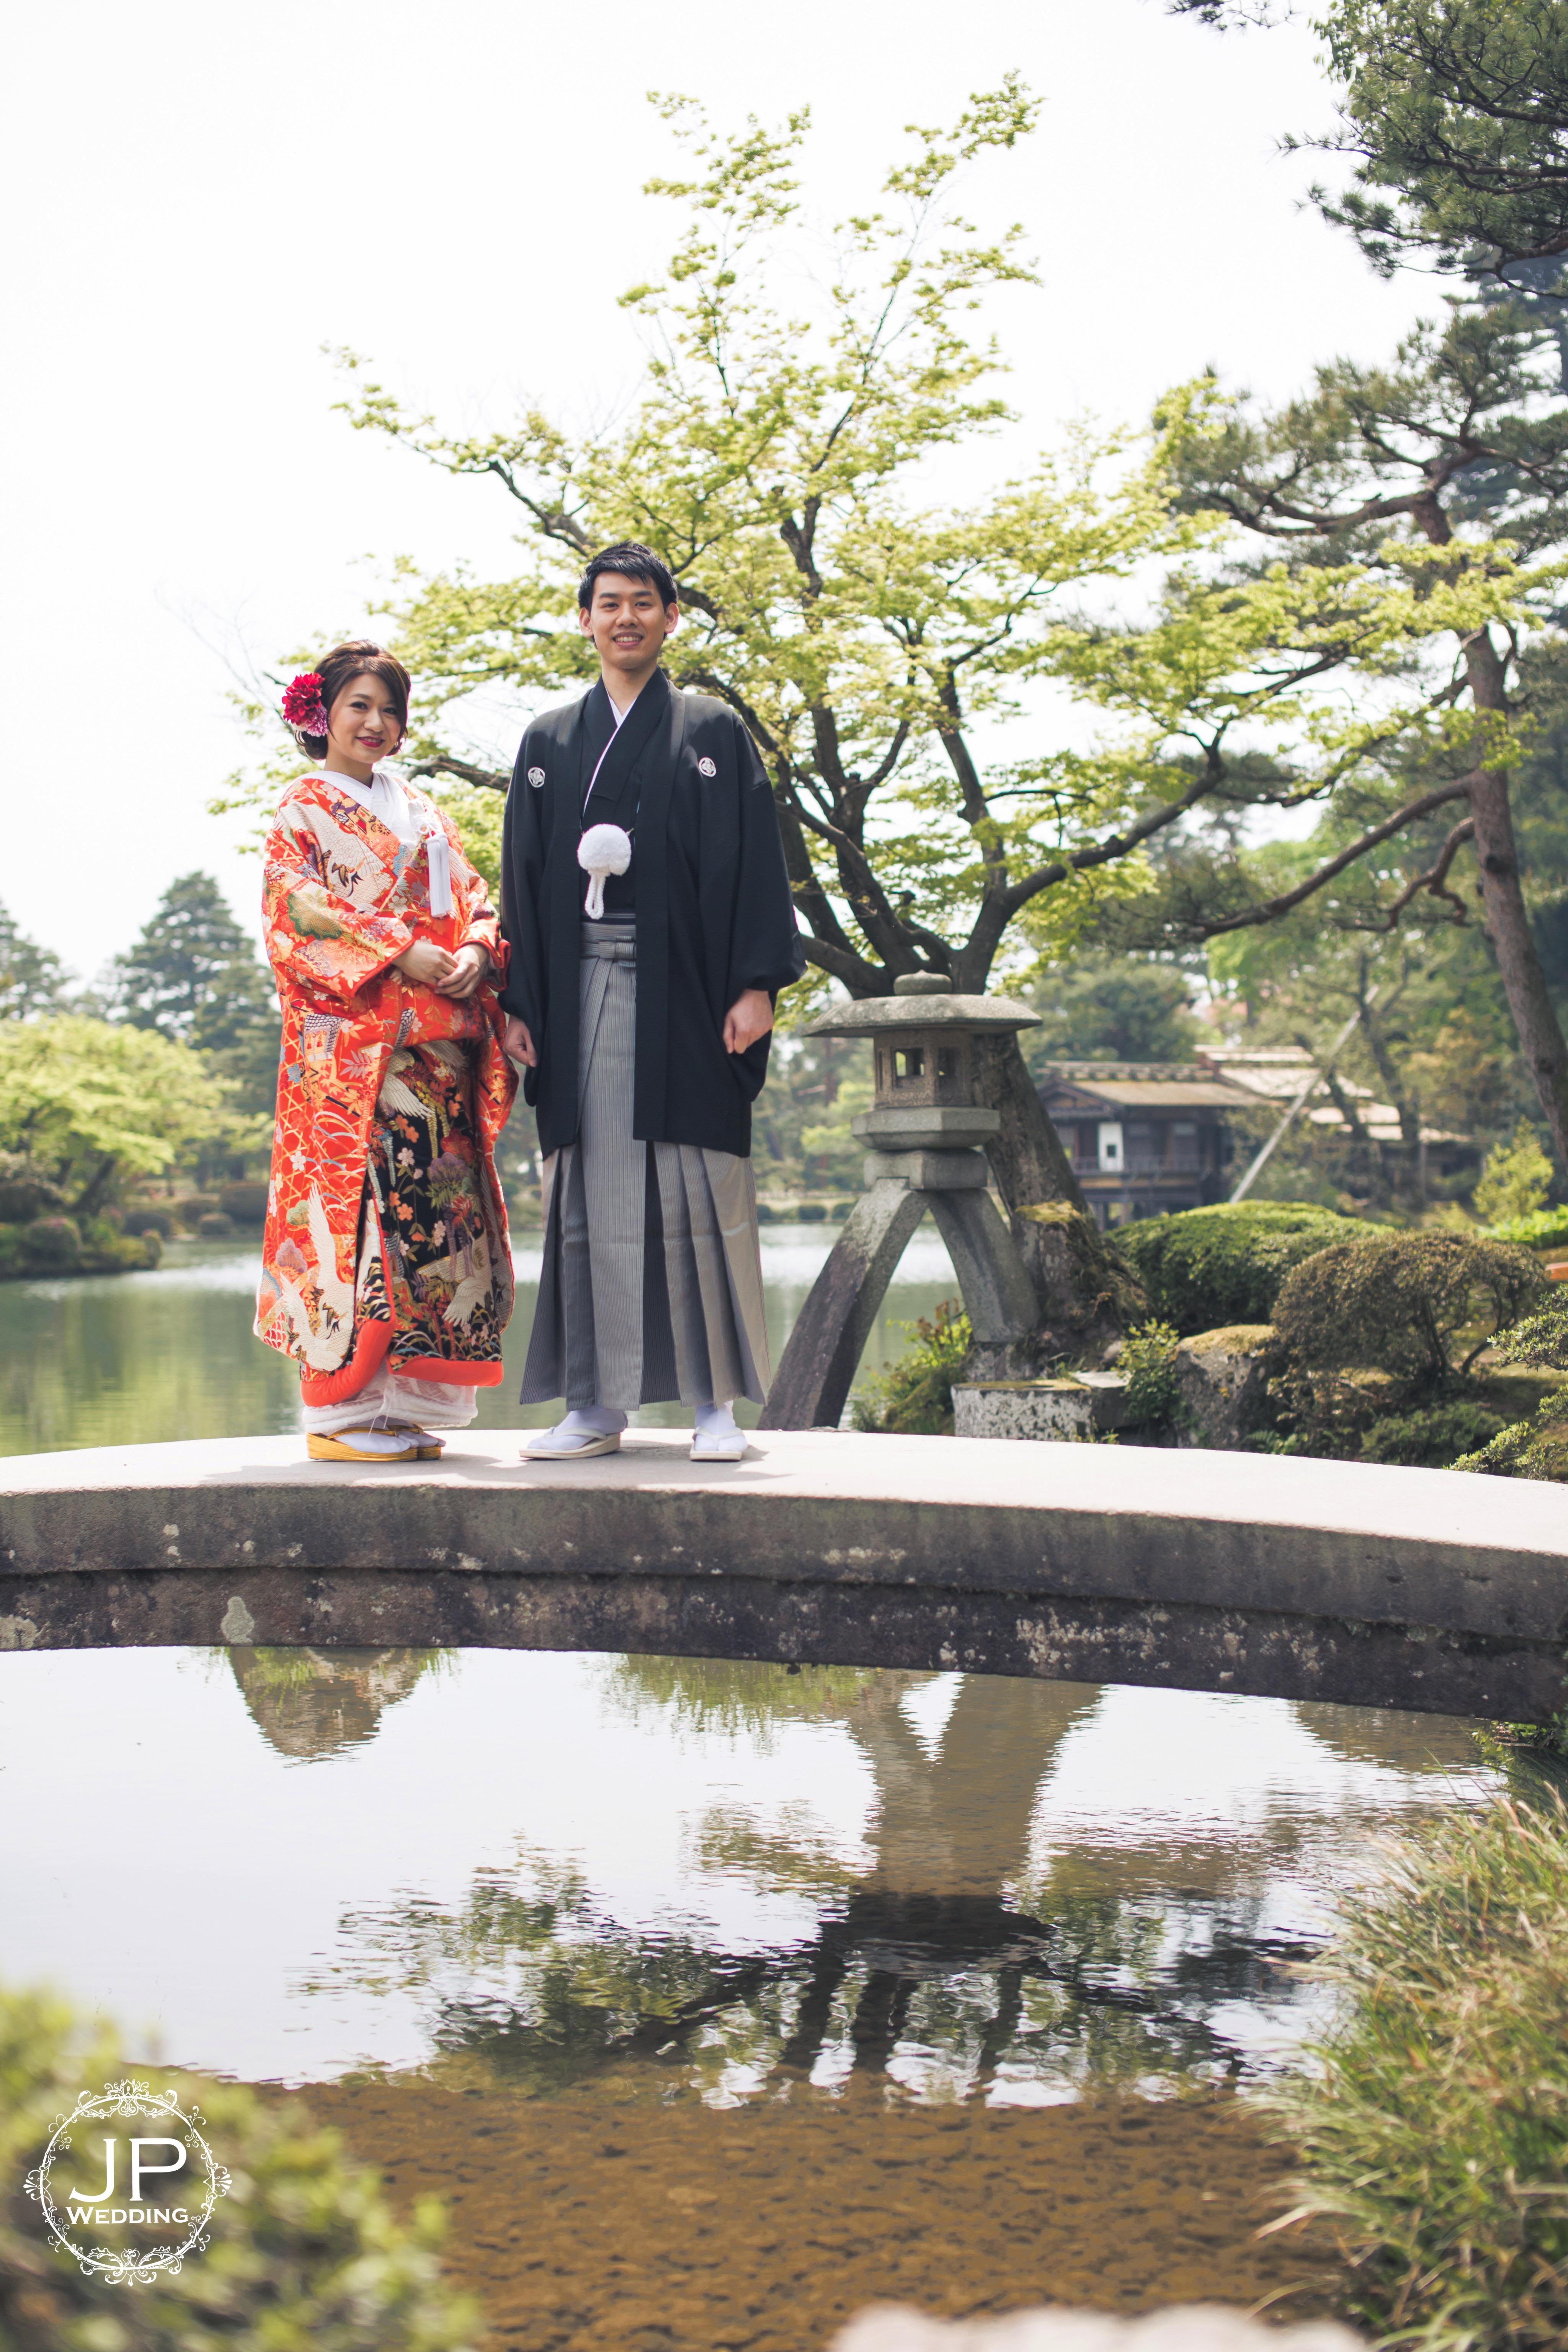 Japan Prewedding Photoshoot- JP Wedding-7